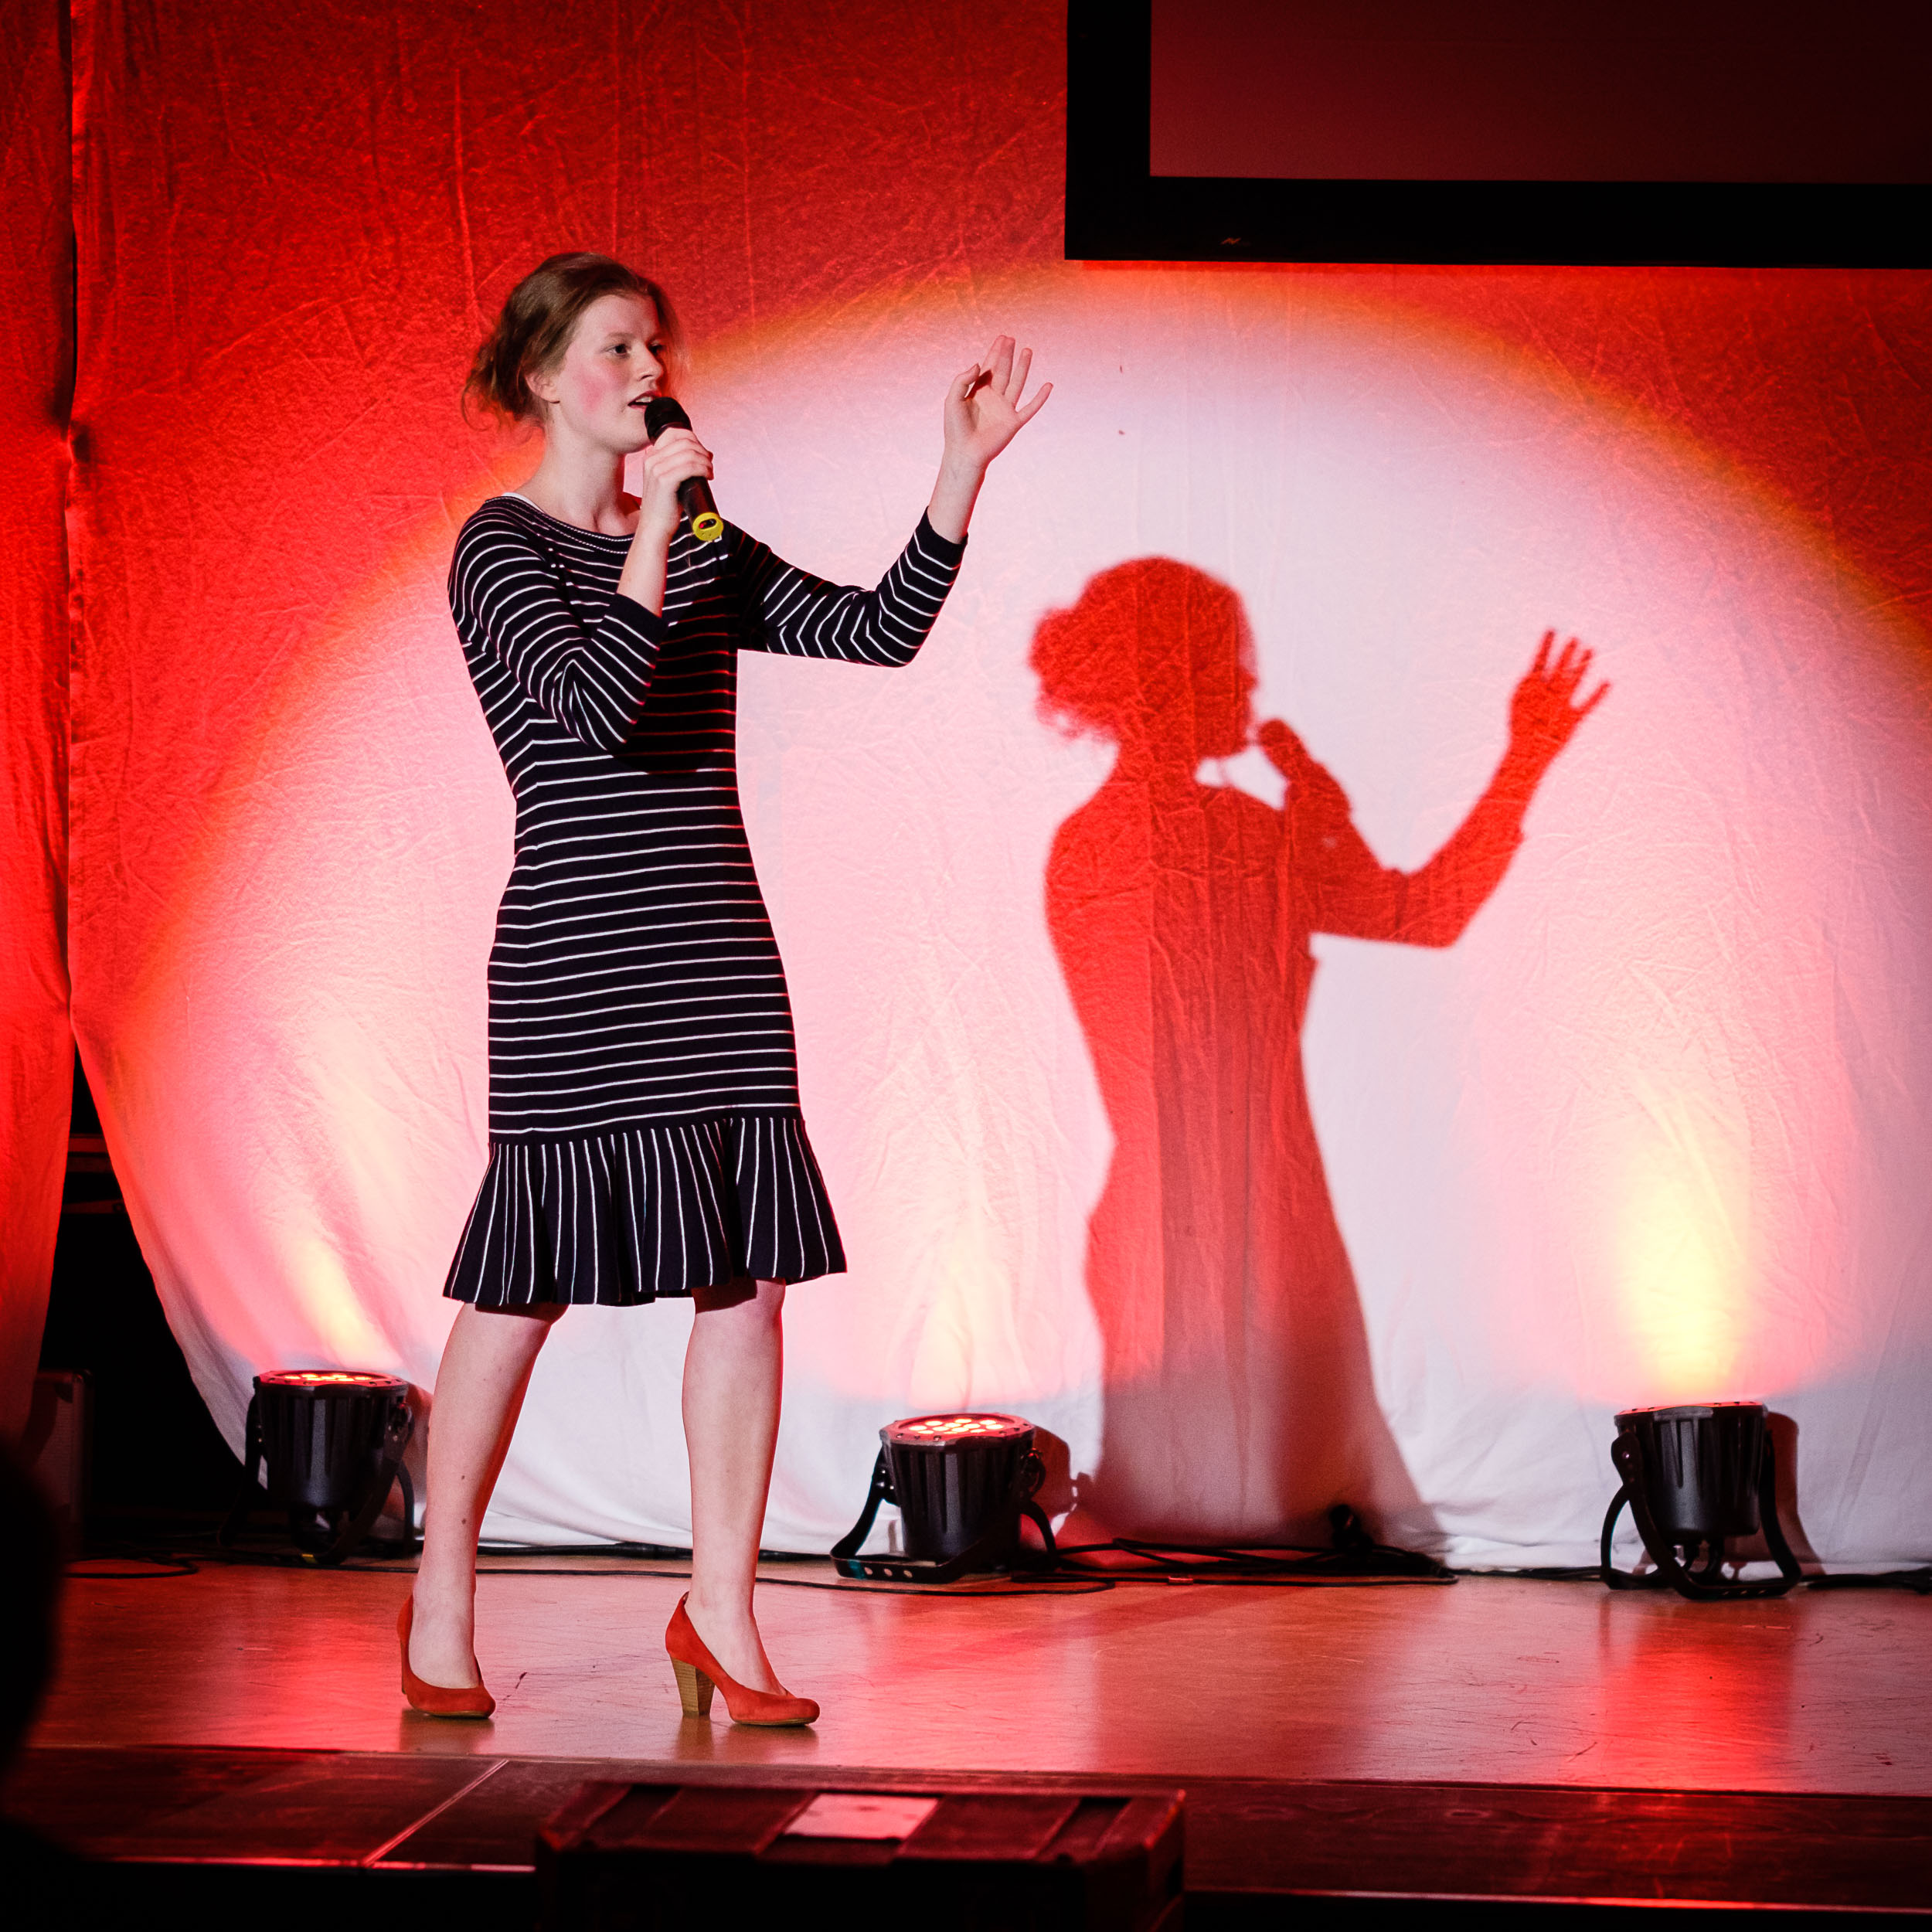 Sängerin Varieté Q1 Wesergymnasium Vlotho WGV 2019